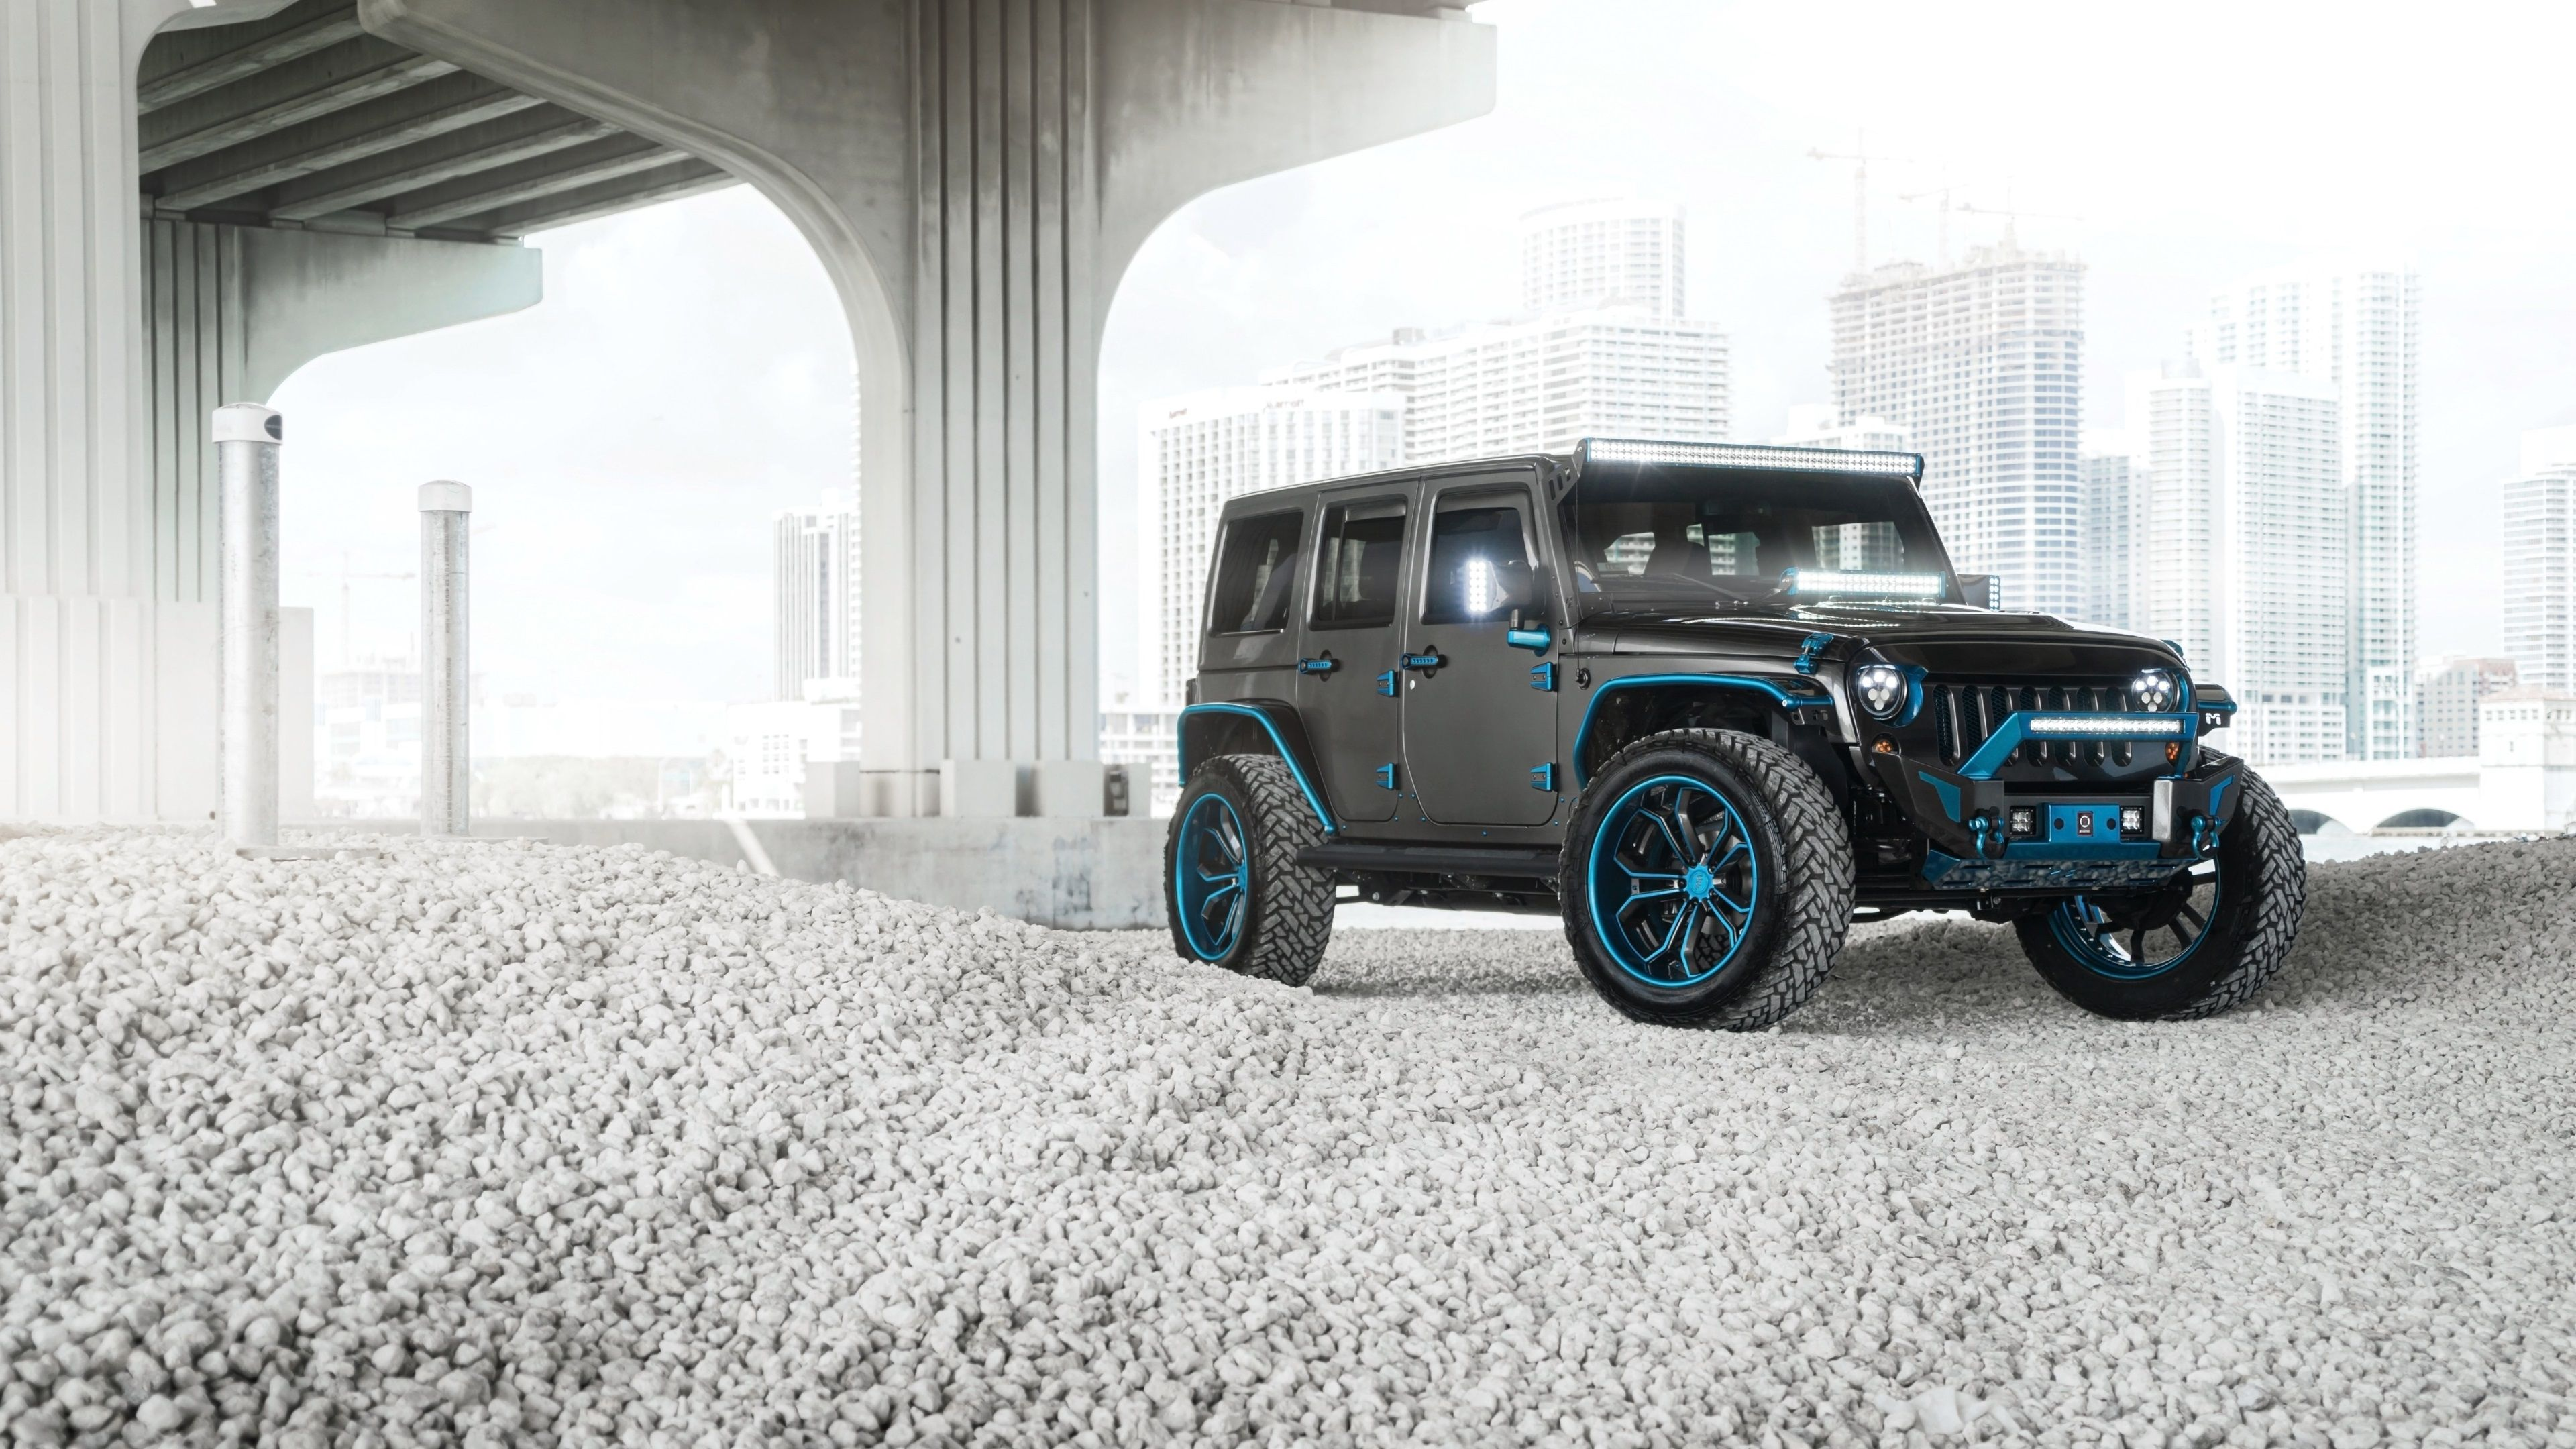 3840x2160 Jeep 4k Download Hd Wallpaper For Desktop Blue Jeep Jeep Custom Jeep Wrangler